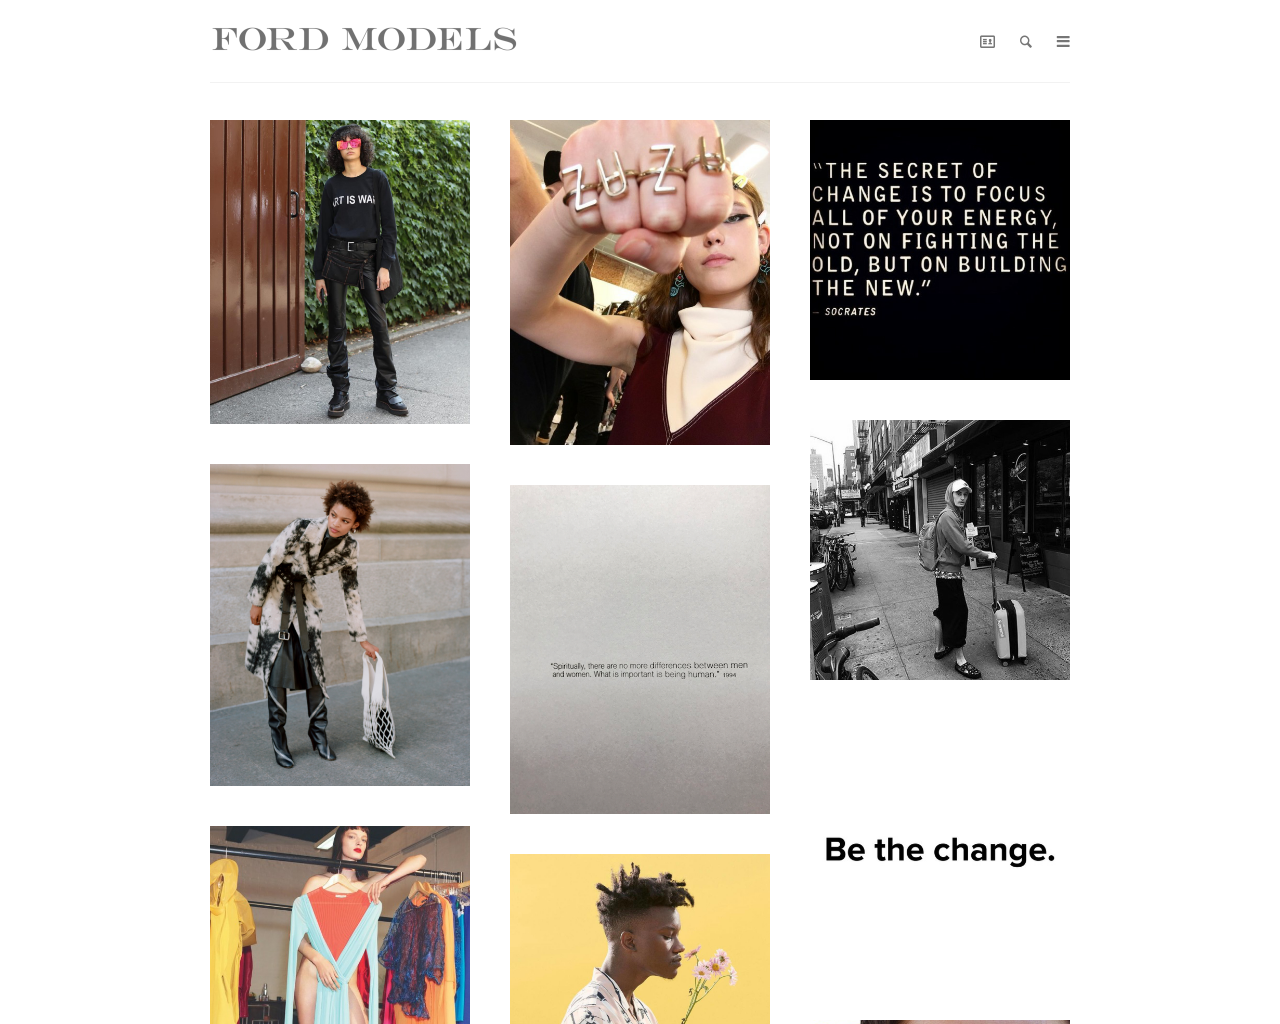 Ford-Models-Blog-Advertising-Reviews-Pricing